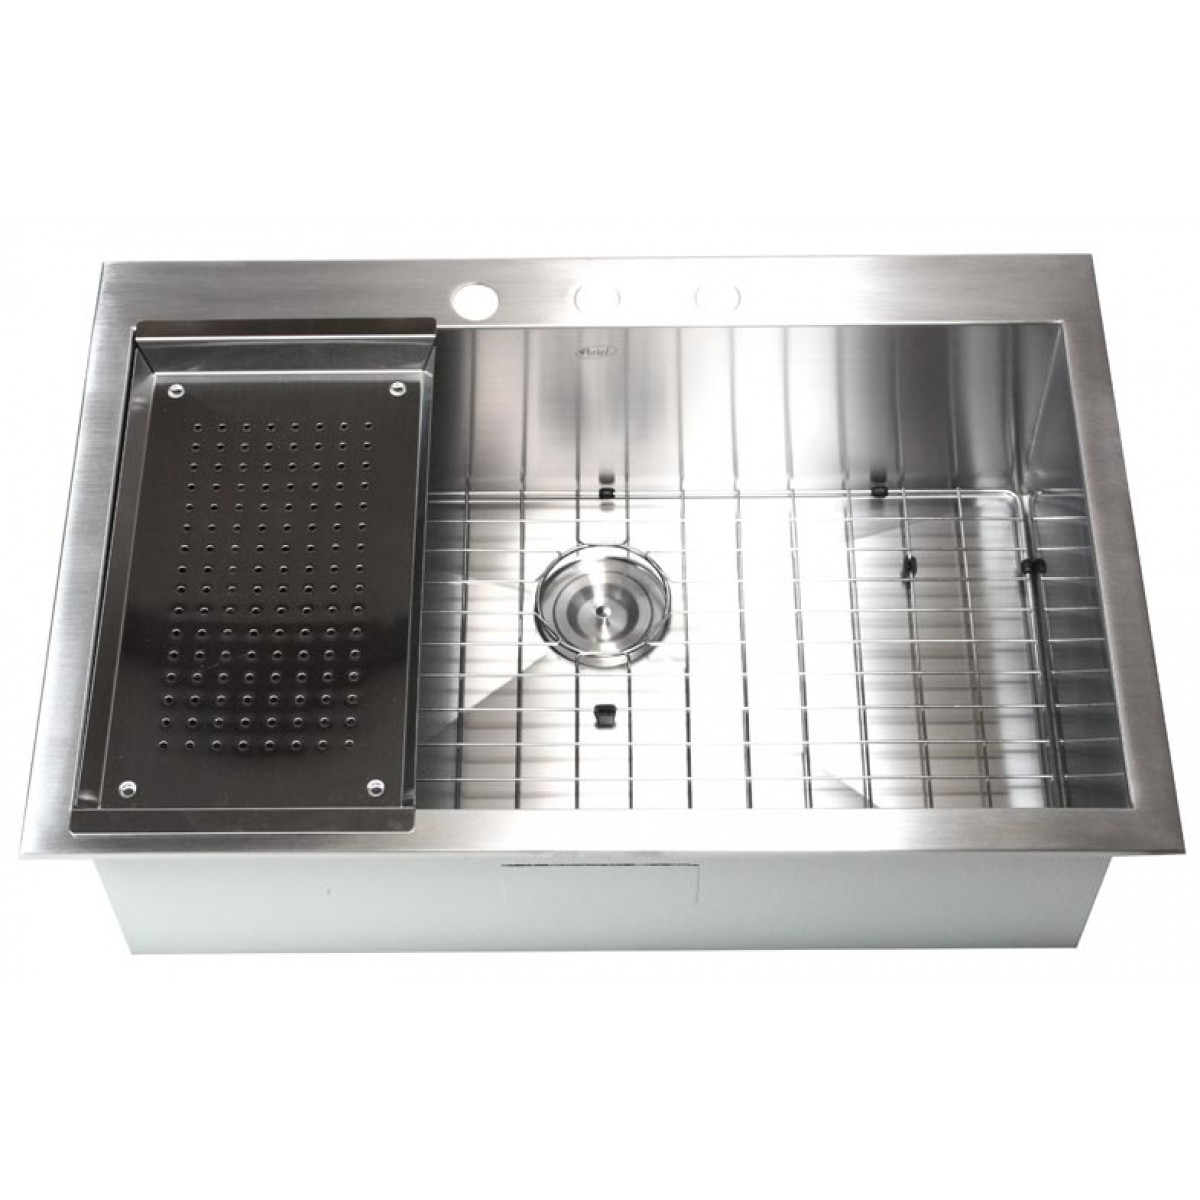 Top Mount Sink Kitchen: 33 Inch Top-Mount / Drop-In Stainless Steel Single Super